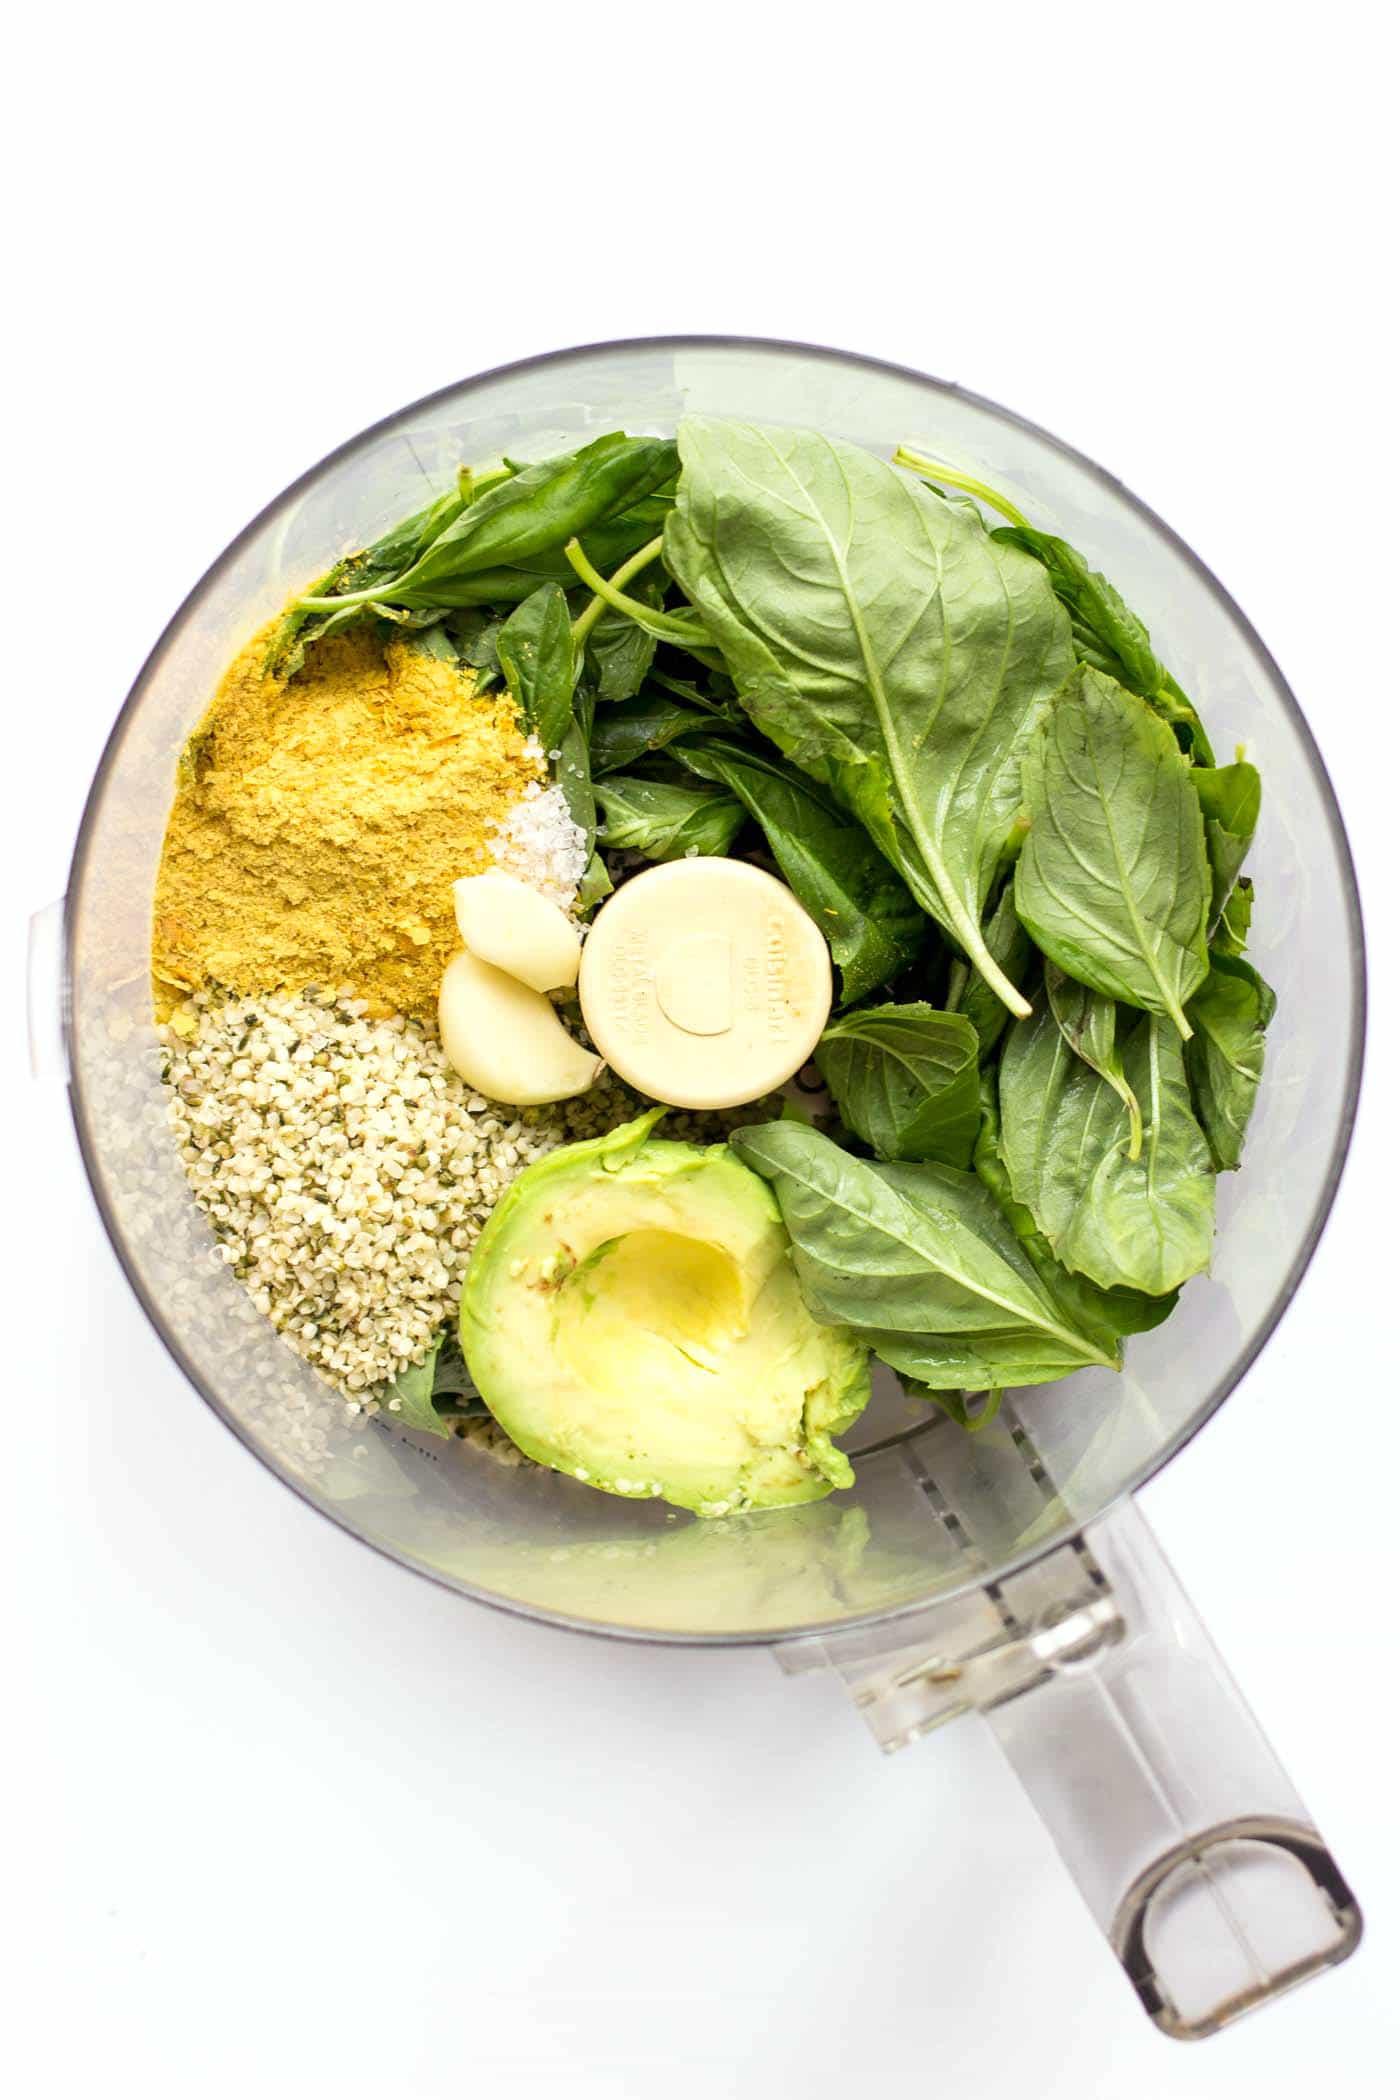 How to make vegan hemp seed pesto using avocados and nutritional yeast!